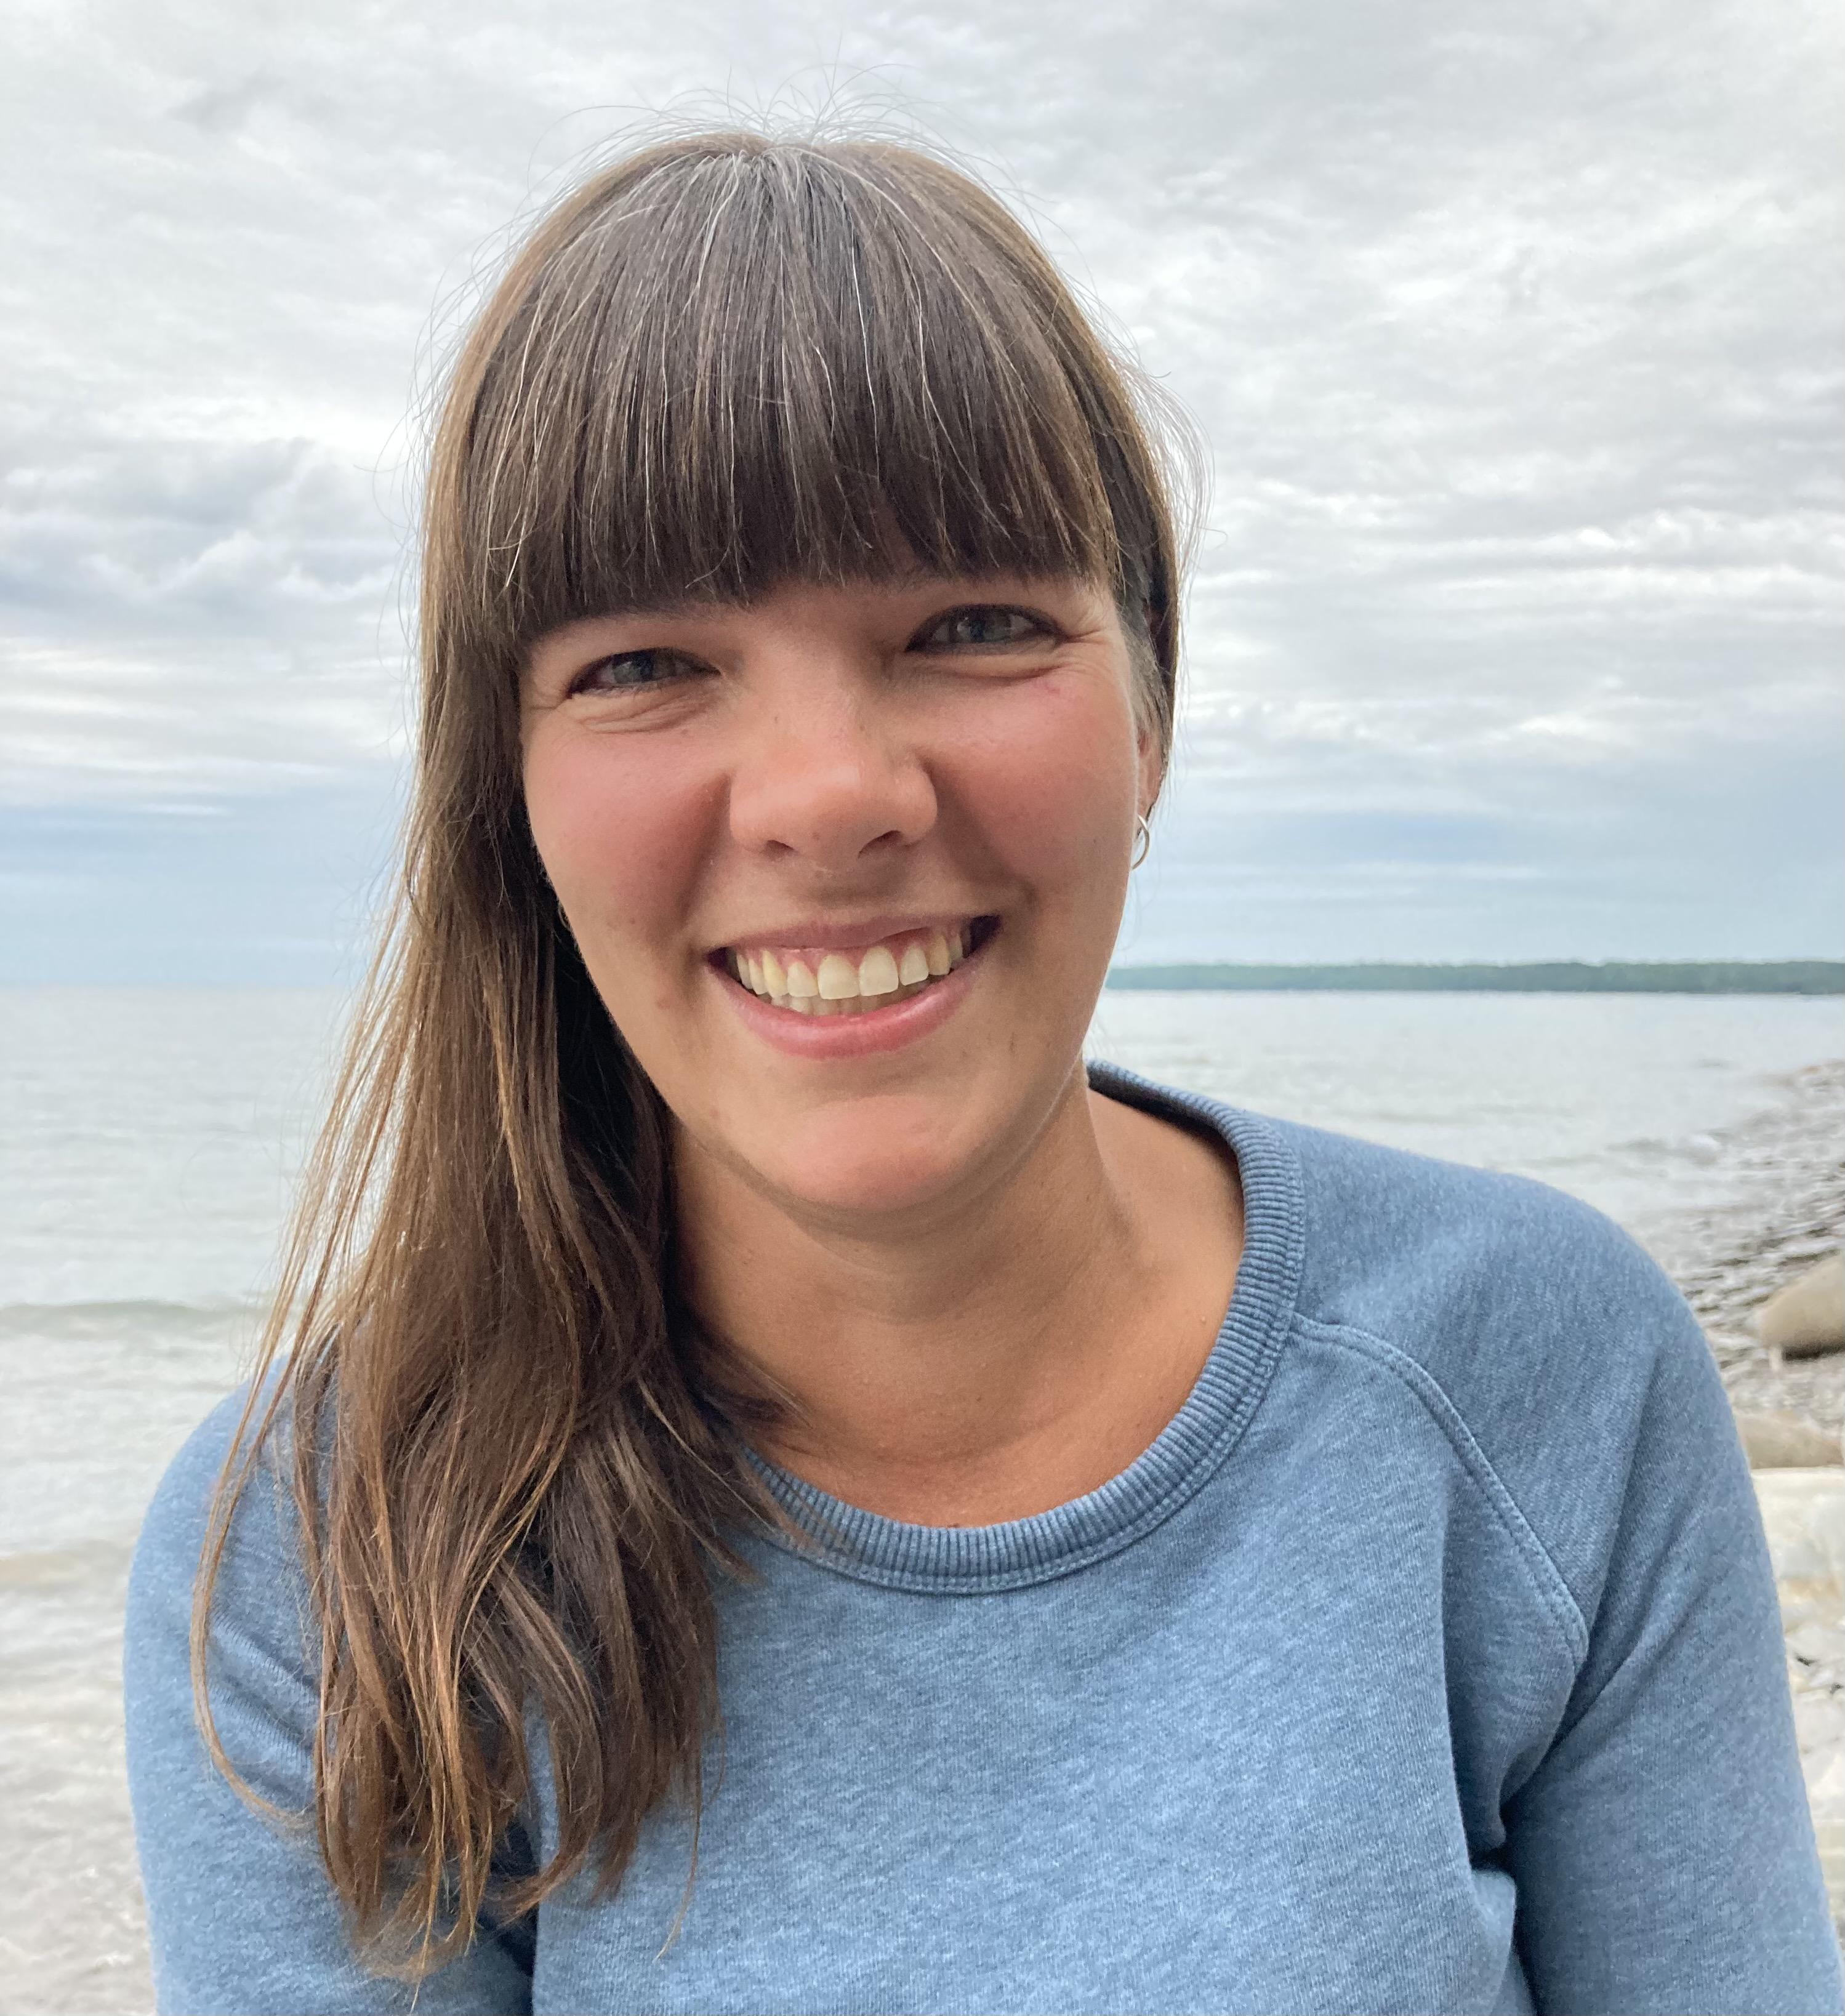 freshwater-future-environmental-organization-canada-program-director